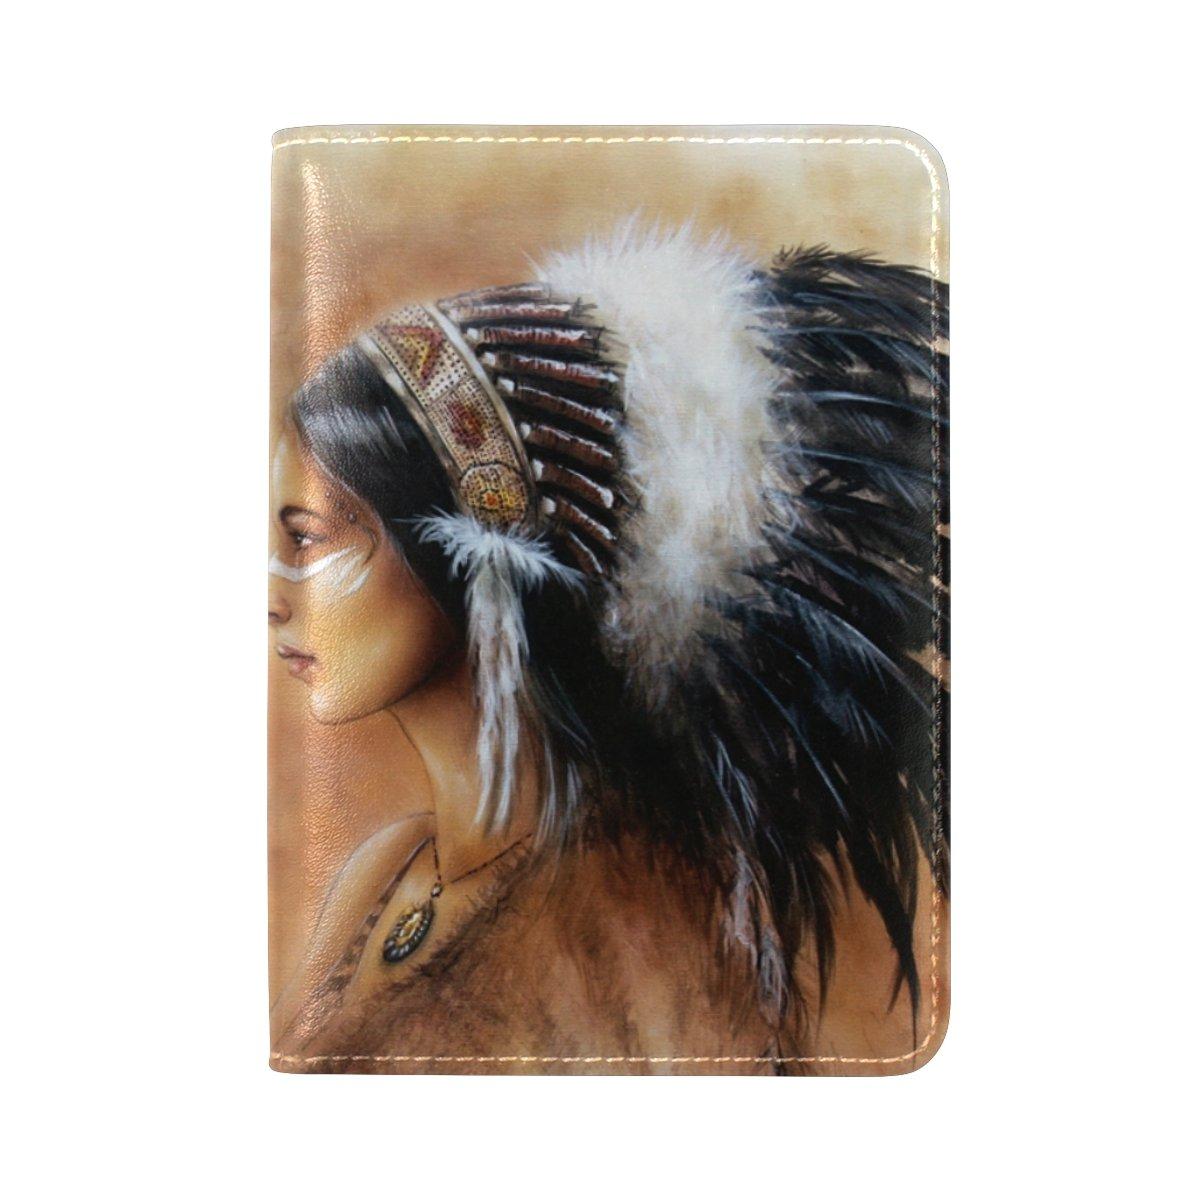 Native American Indian Art Prints Leather Passport Cover - Holder - for Men & Women - Passport Case